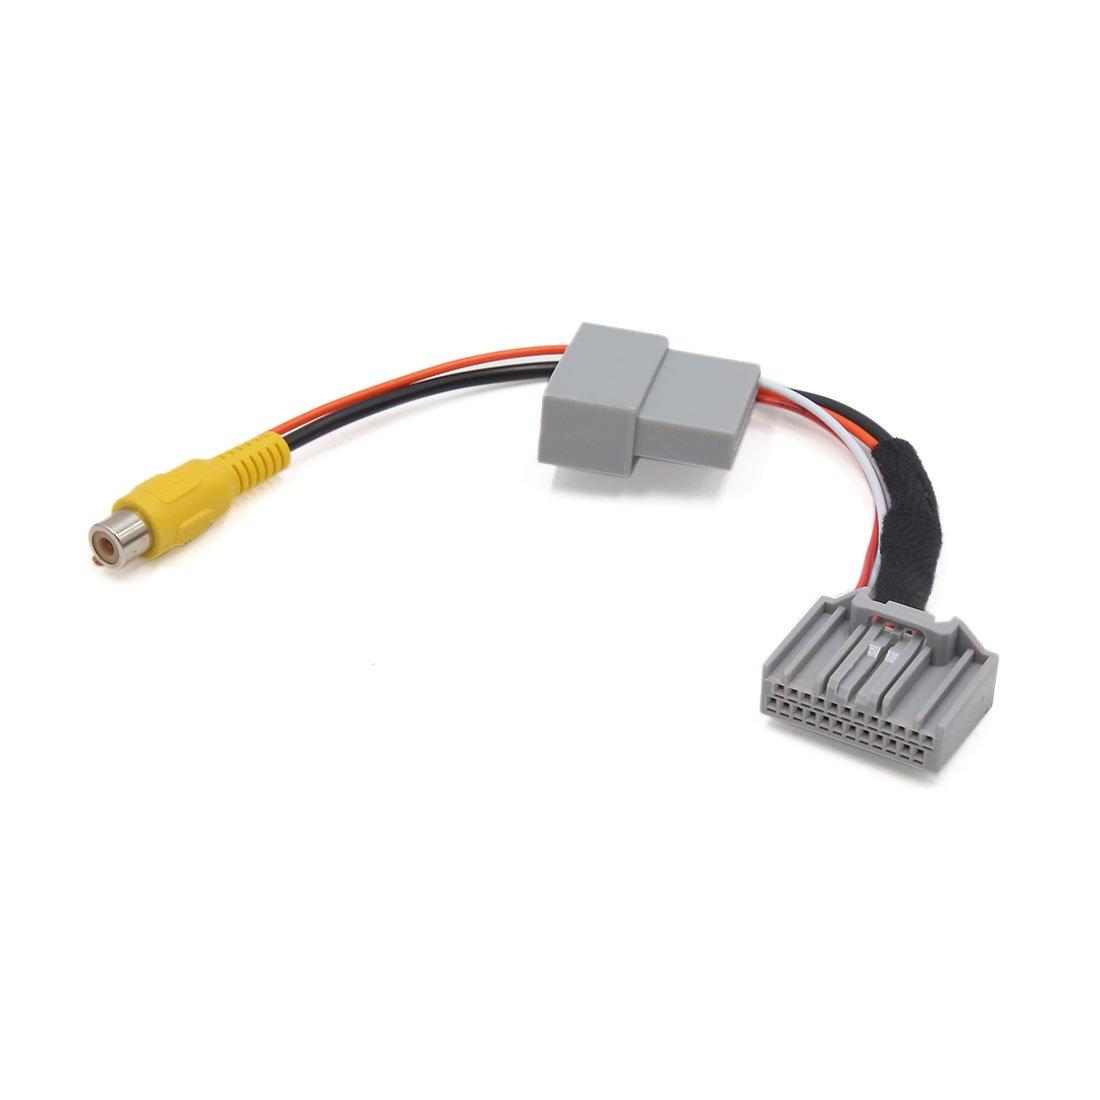 sourcing map Adaptador Cable de C/ámara Navegaci/ón Reversa Parking para Veh/ículo Accord 2,4